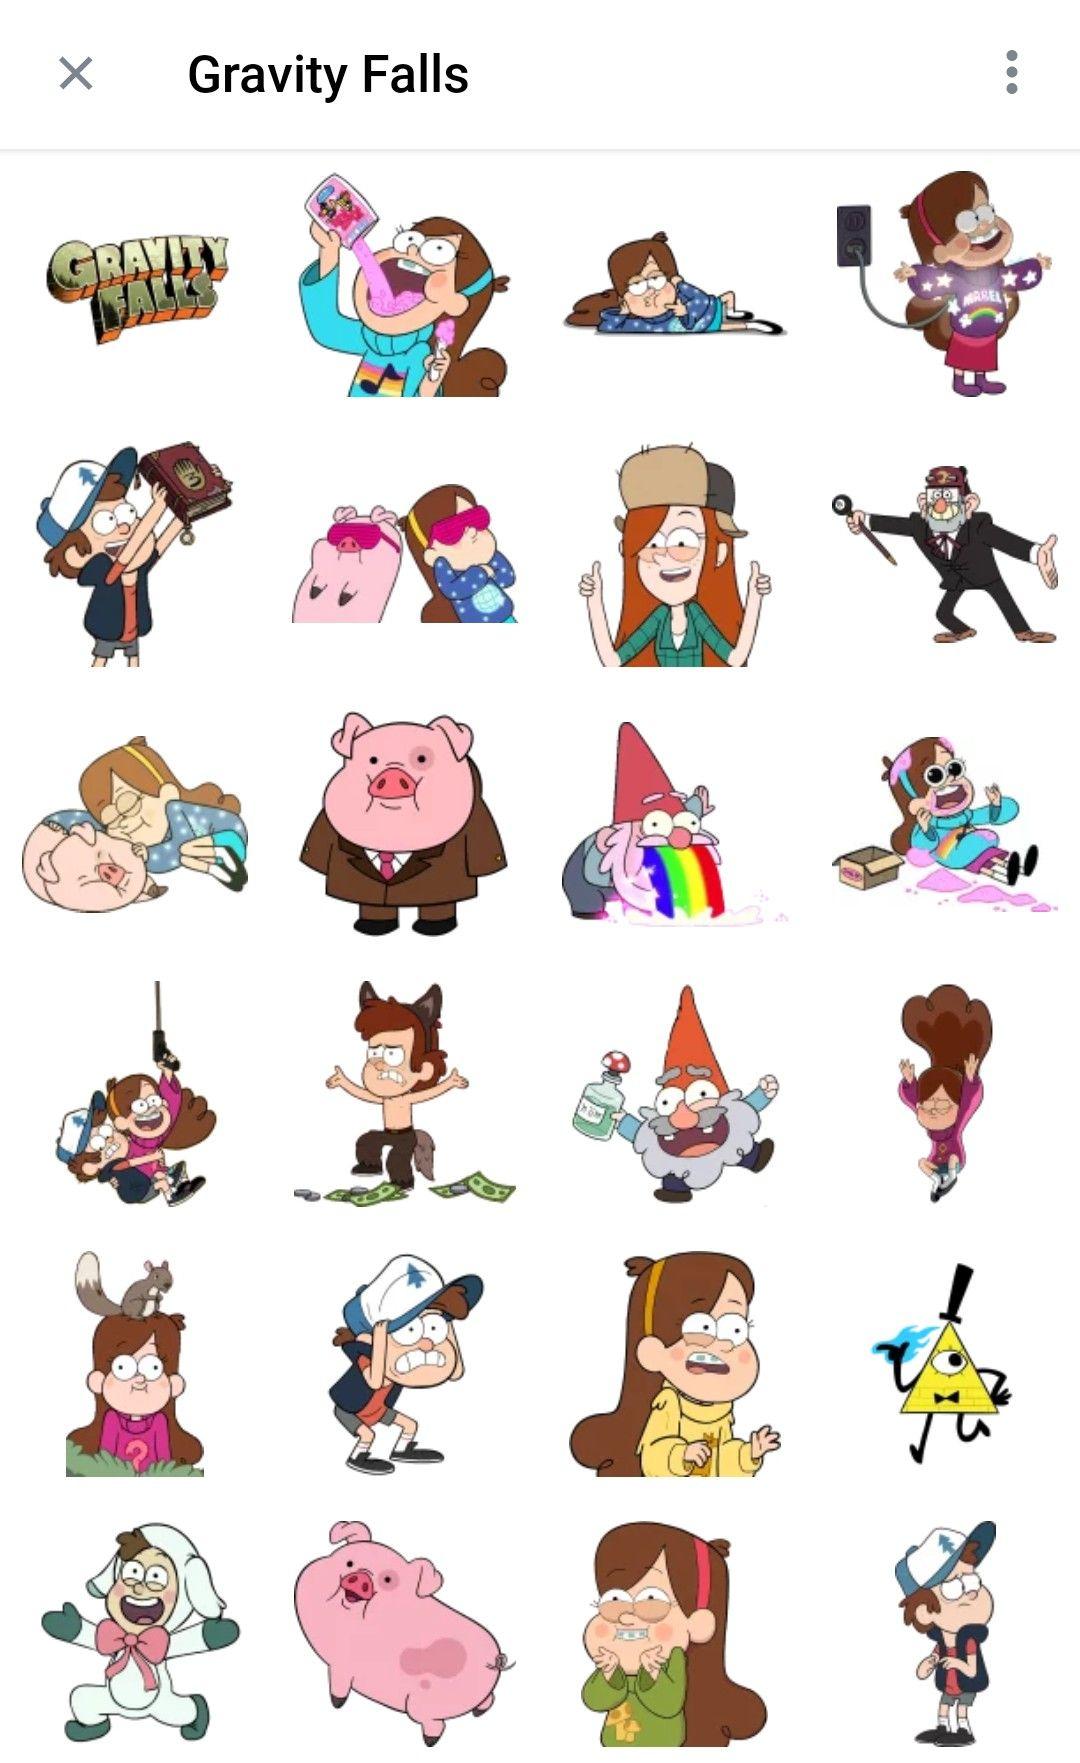 Gravity Falls Telegram Stickers Pack Gravity Falls Telegram Stickers Cute Stickers